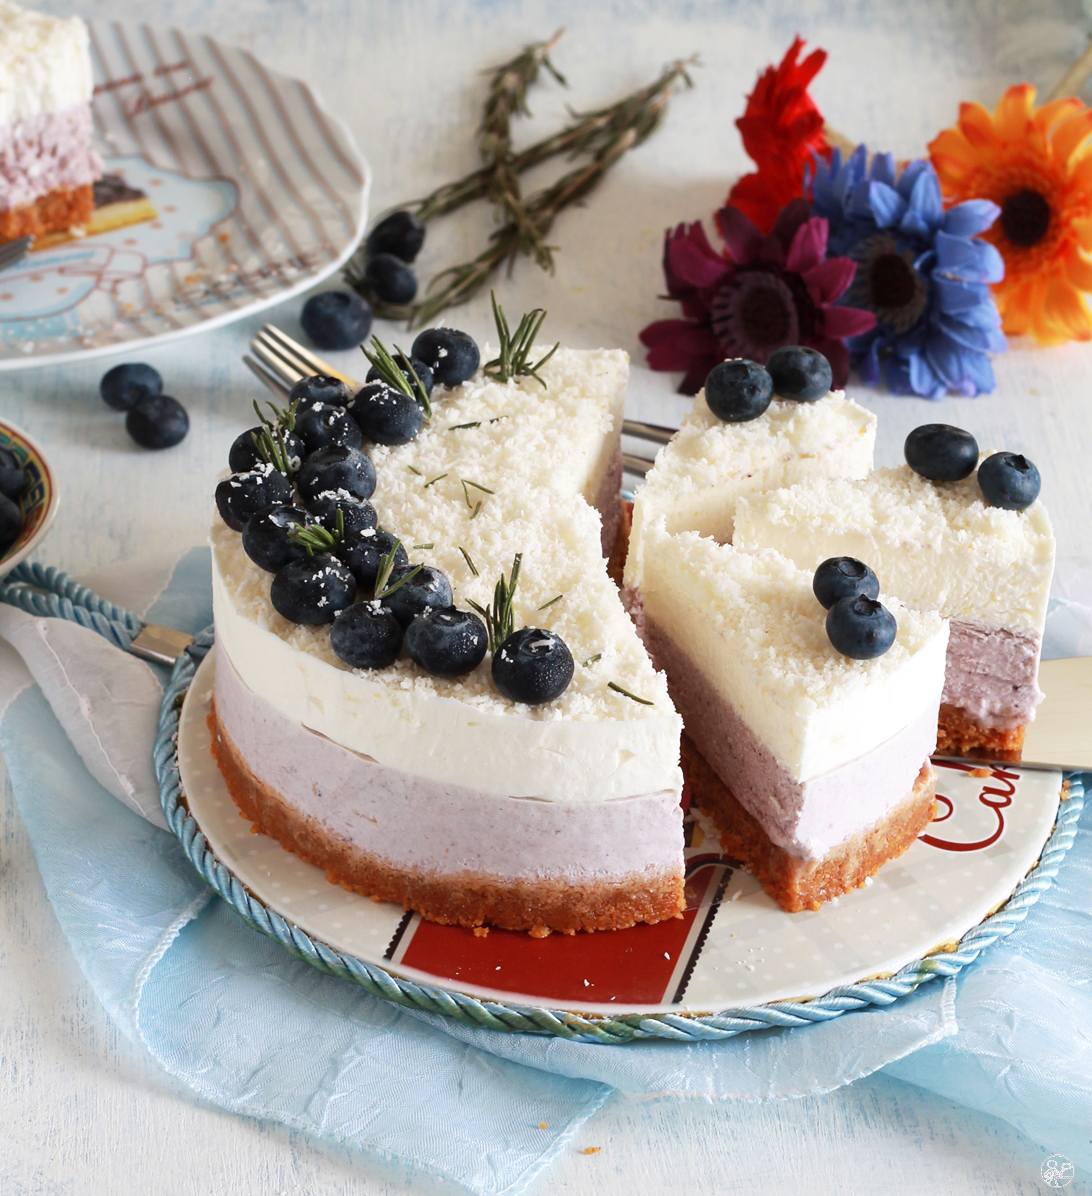 Cheesecake ai mirtilli senza glutine, senza uova, senza zucchero - La Cassata Celiaca